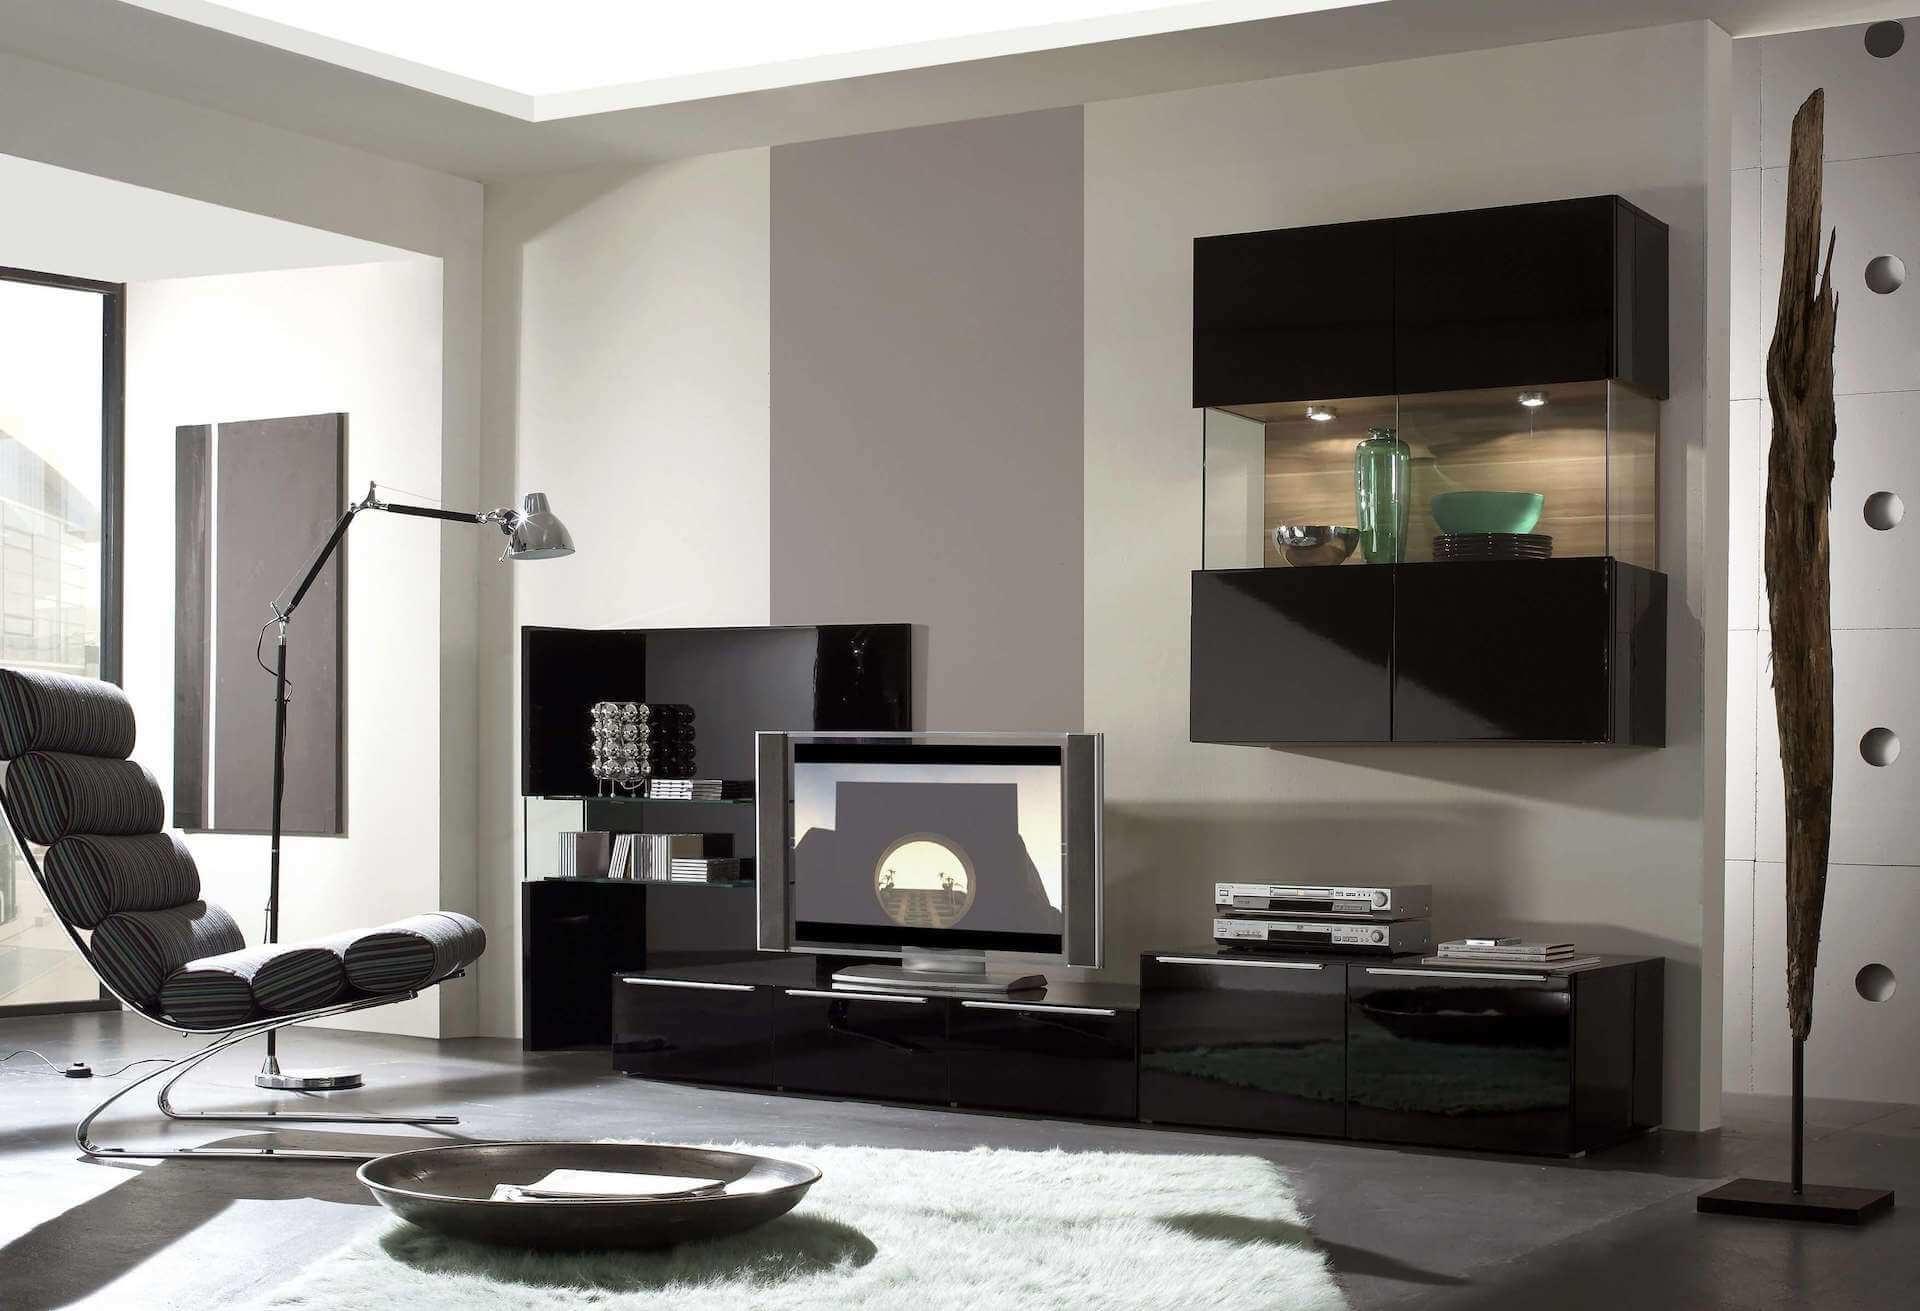 Stunning-contemporary-furniture-living-room-ideas.jpg